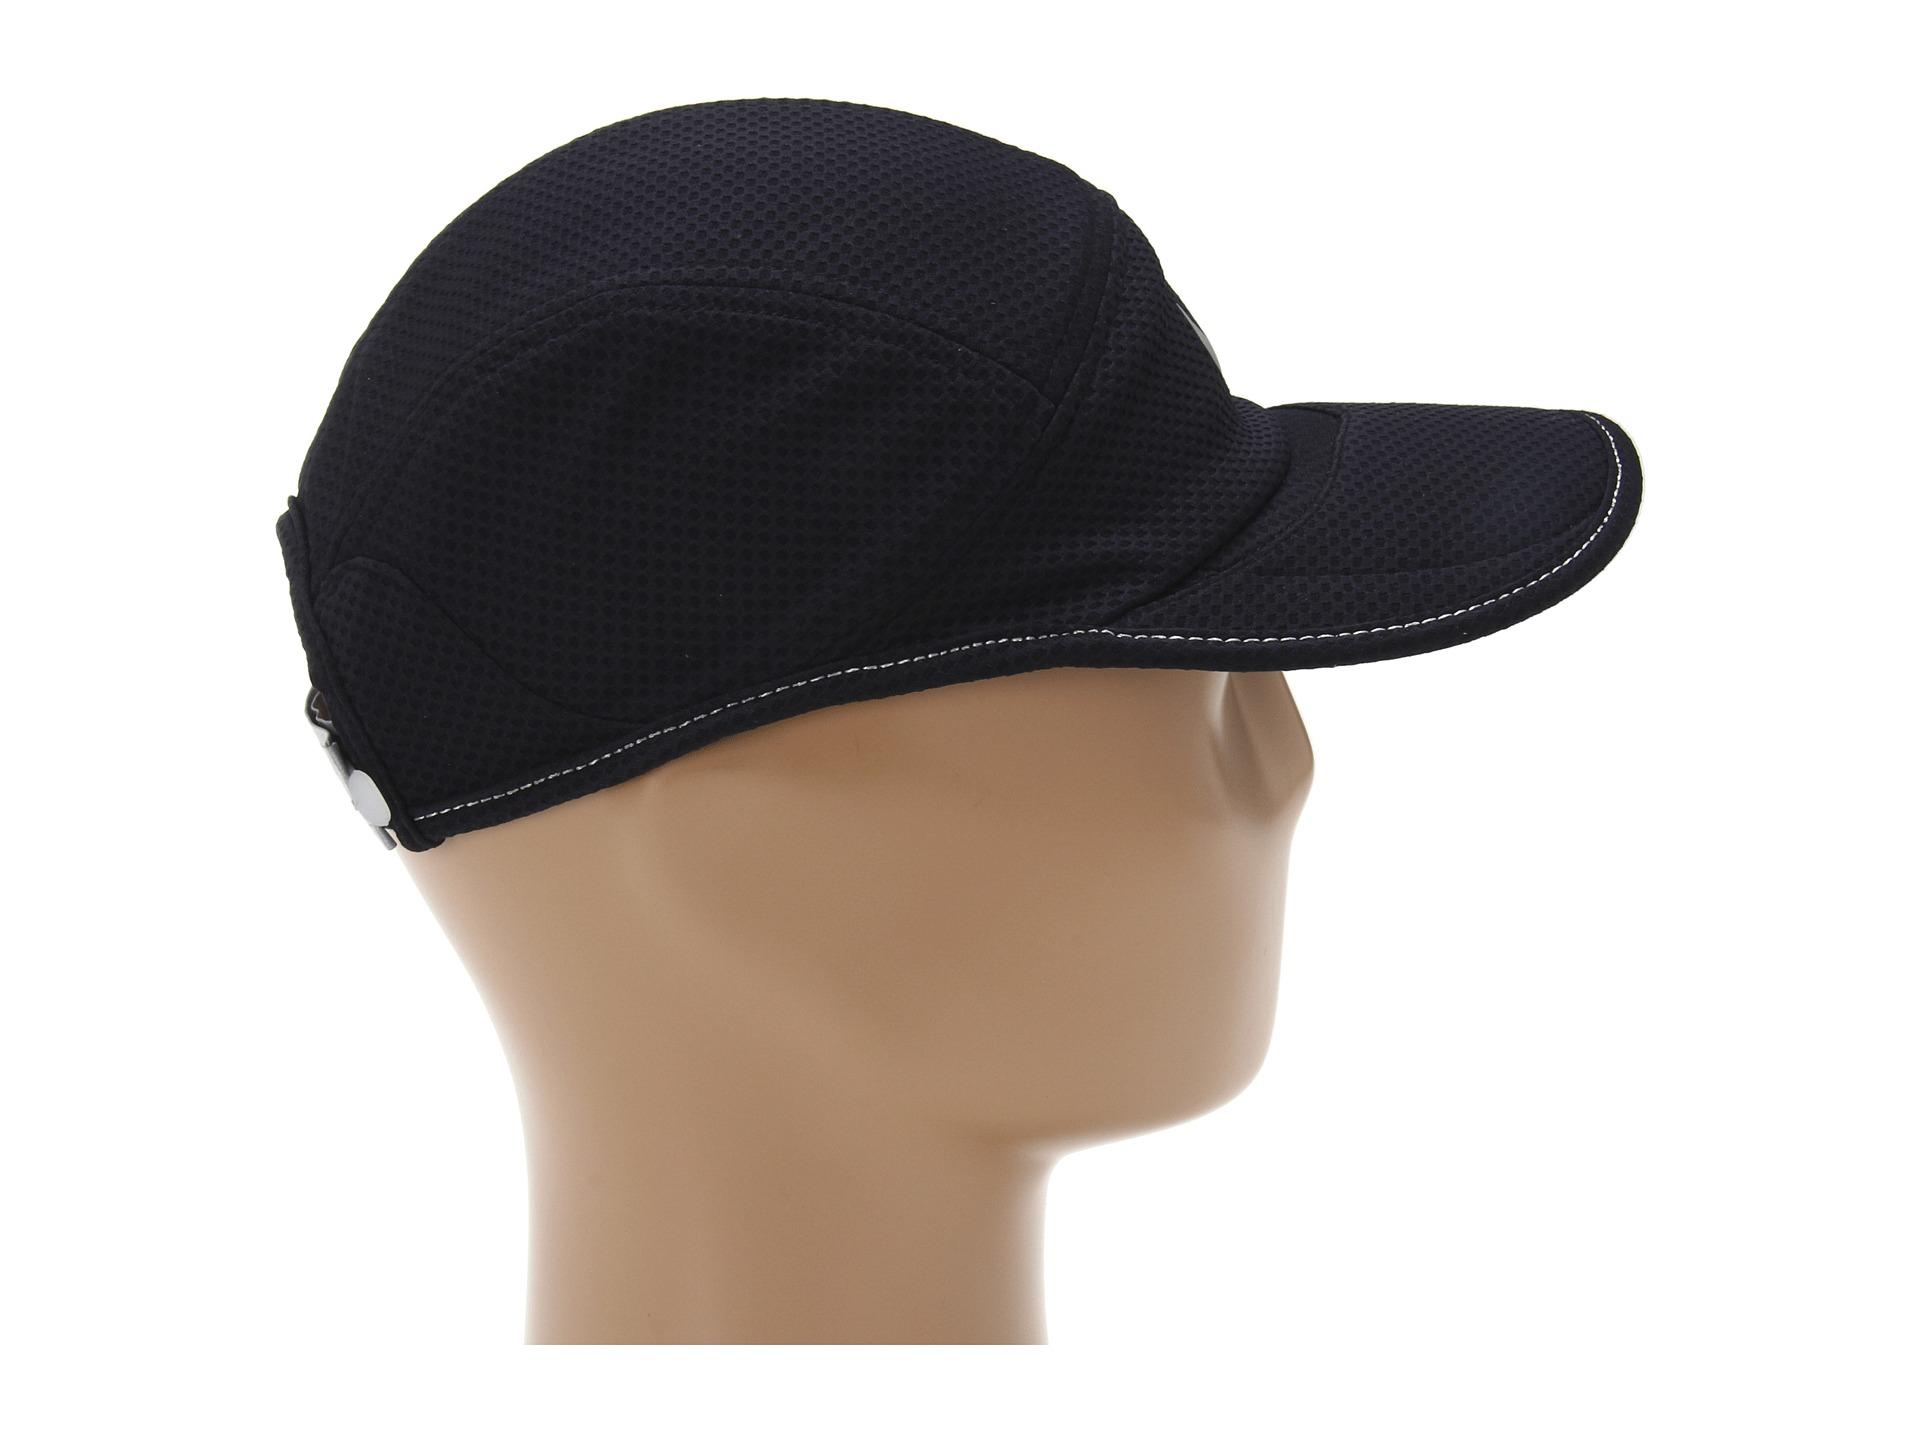 Lyst - Nike Ru Tw Mesh Daybreak Cap in Black c75ad7727e6